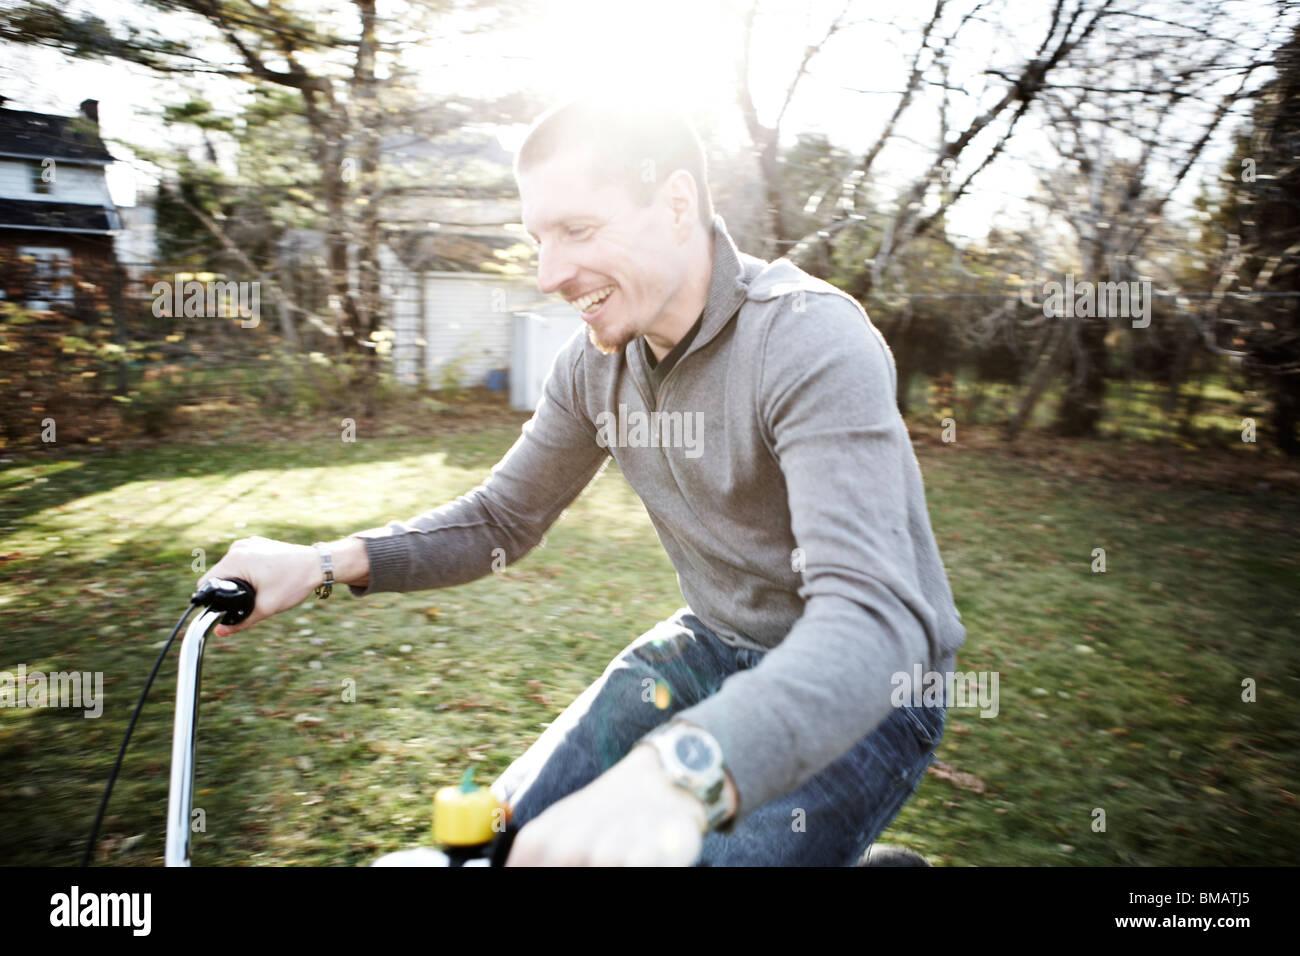 hombre en bicicleta Imagen De Stock